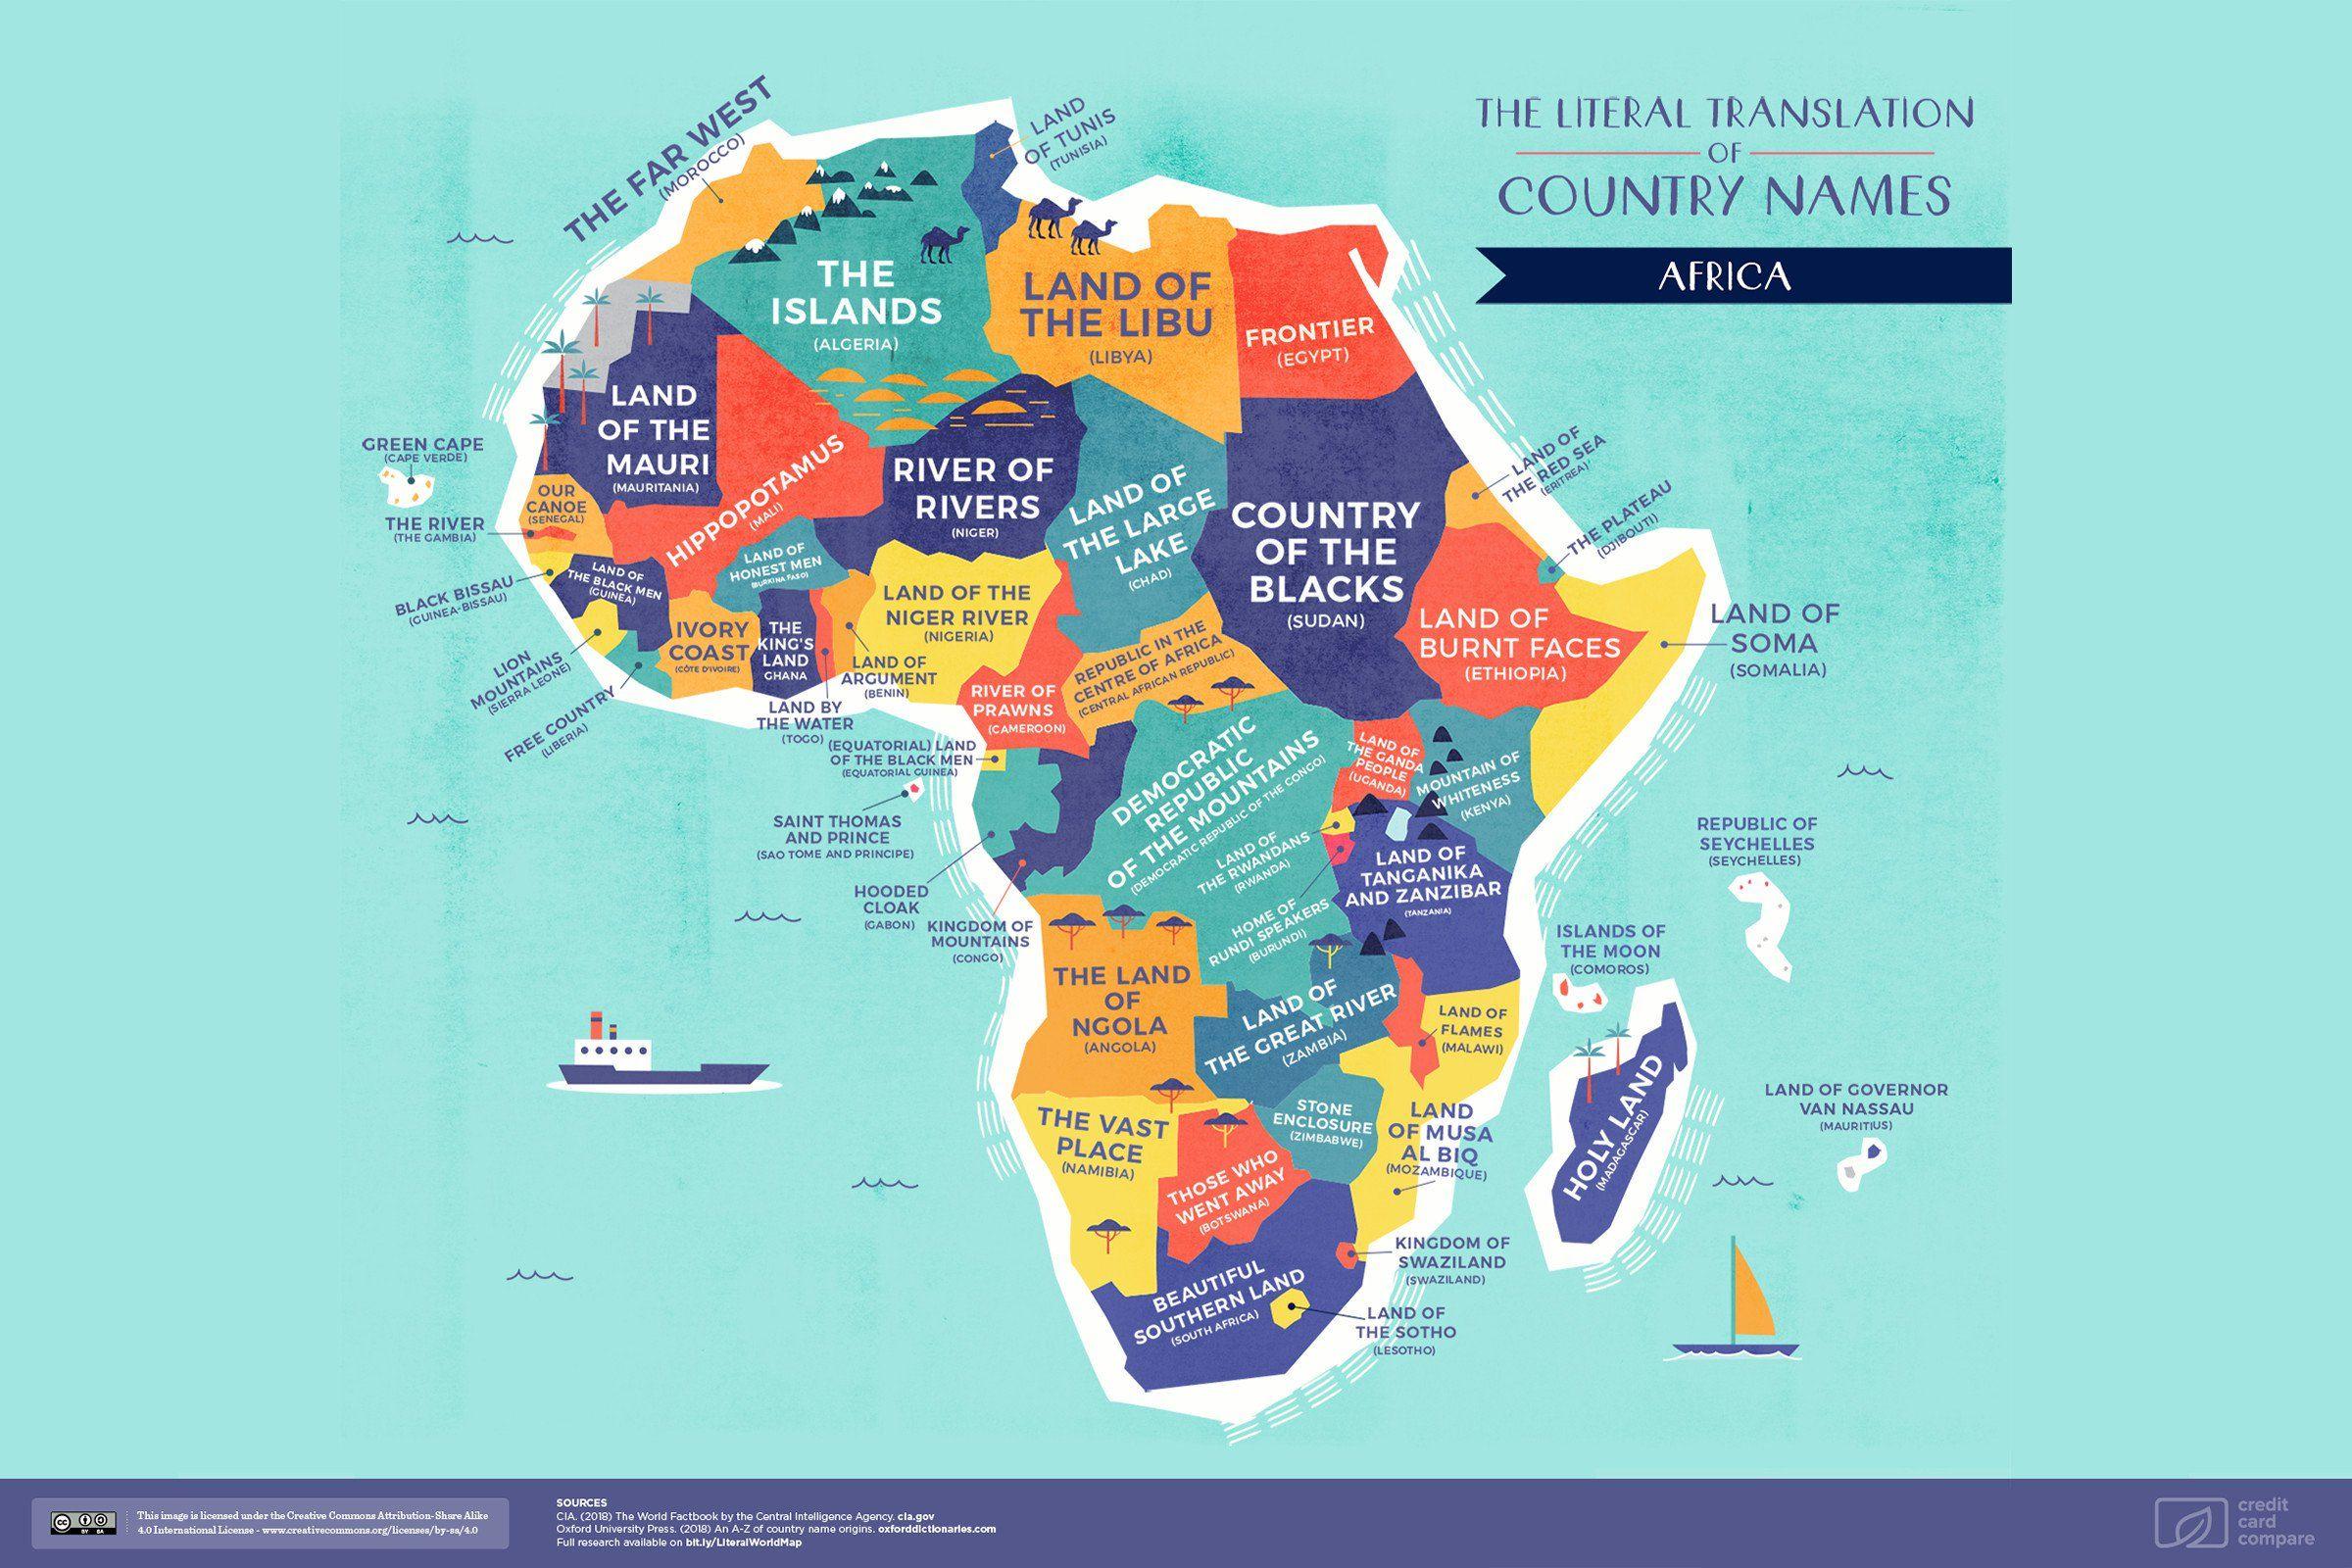 the original name of south africa